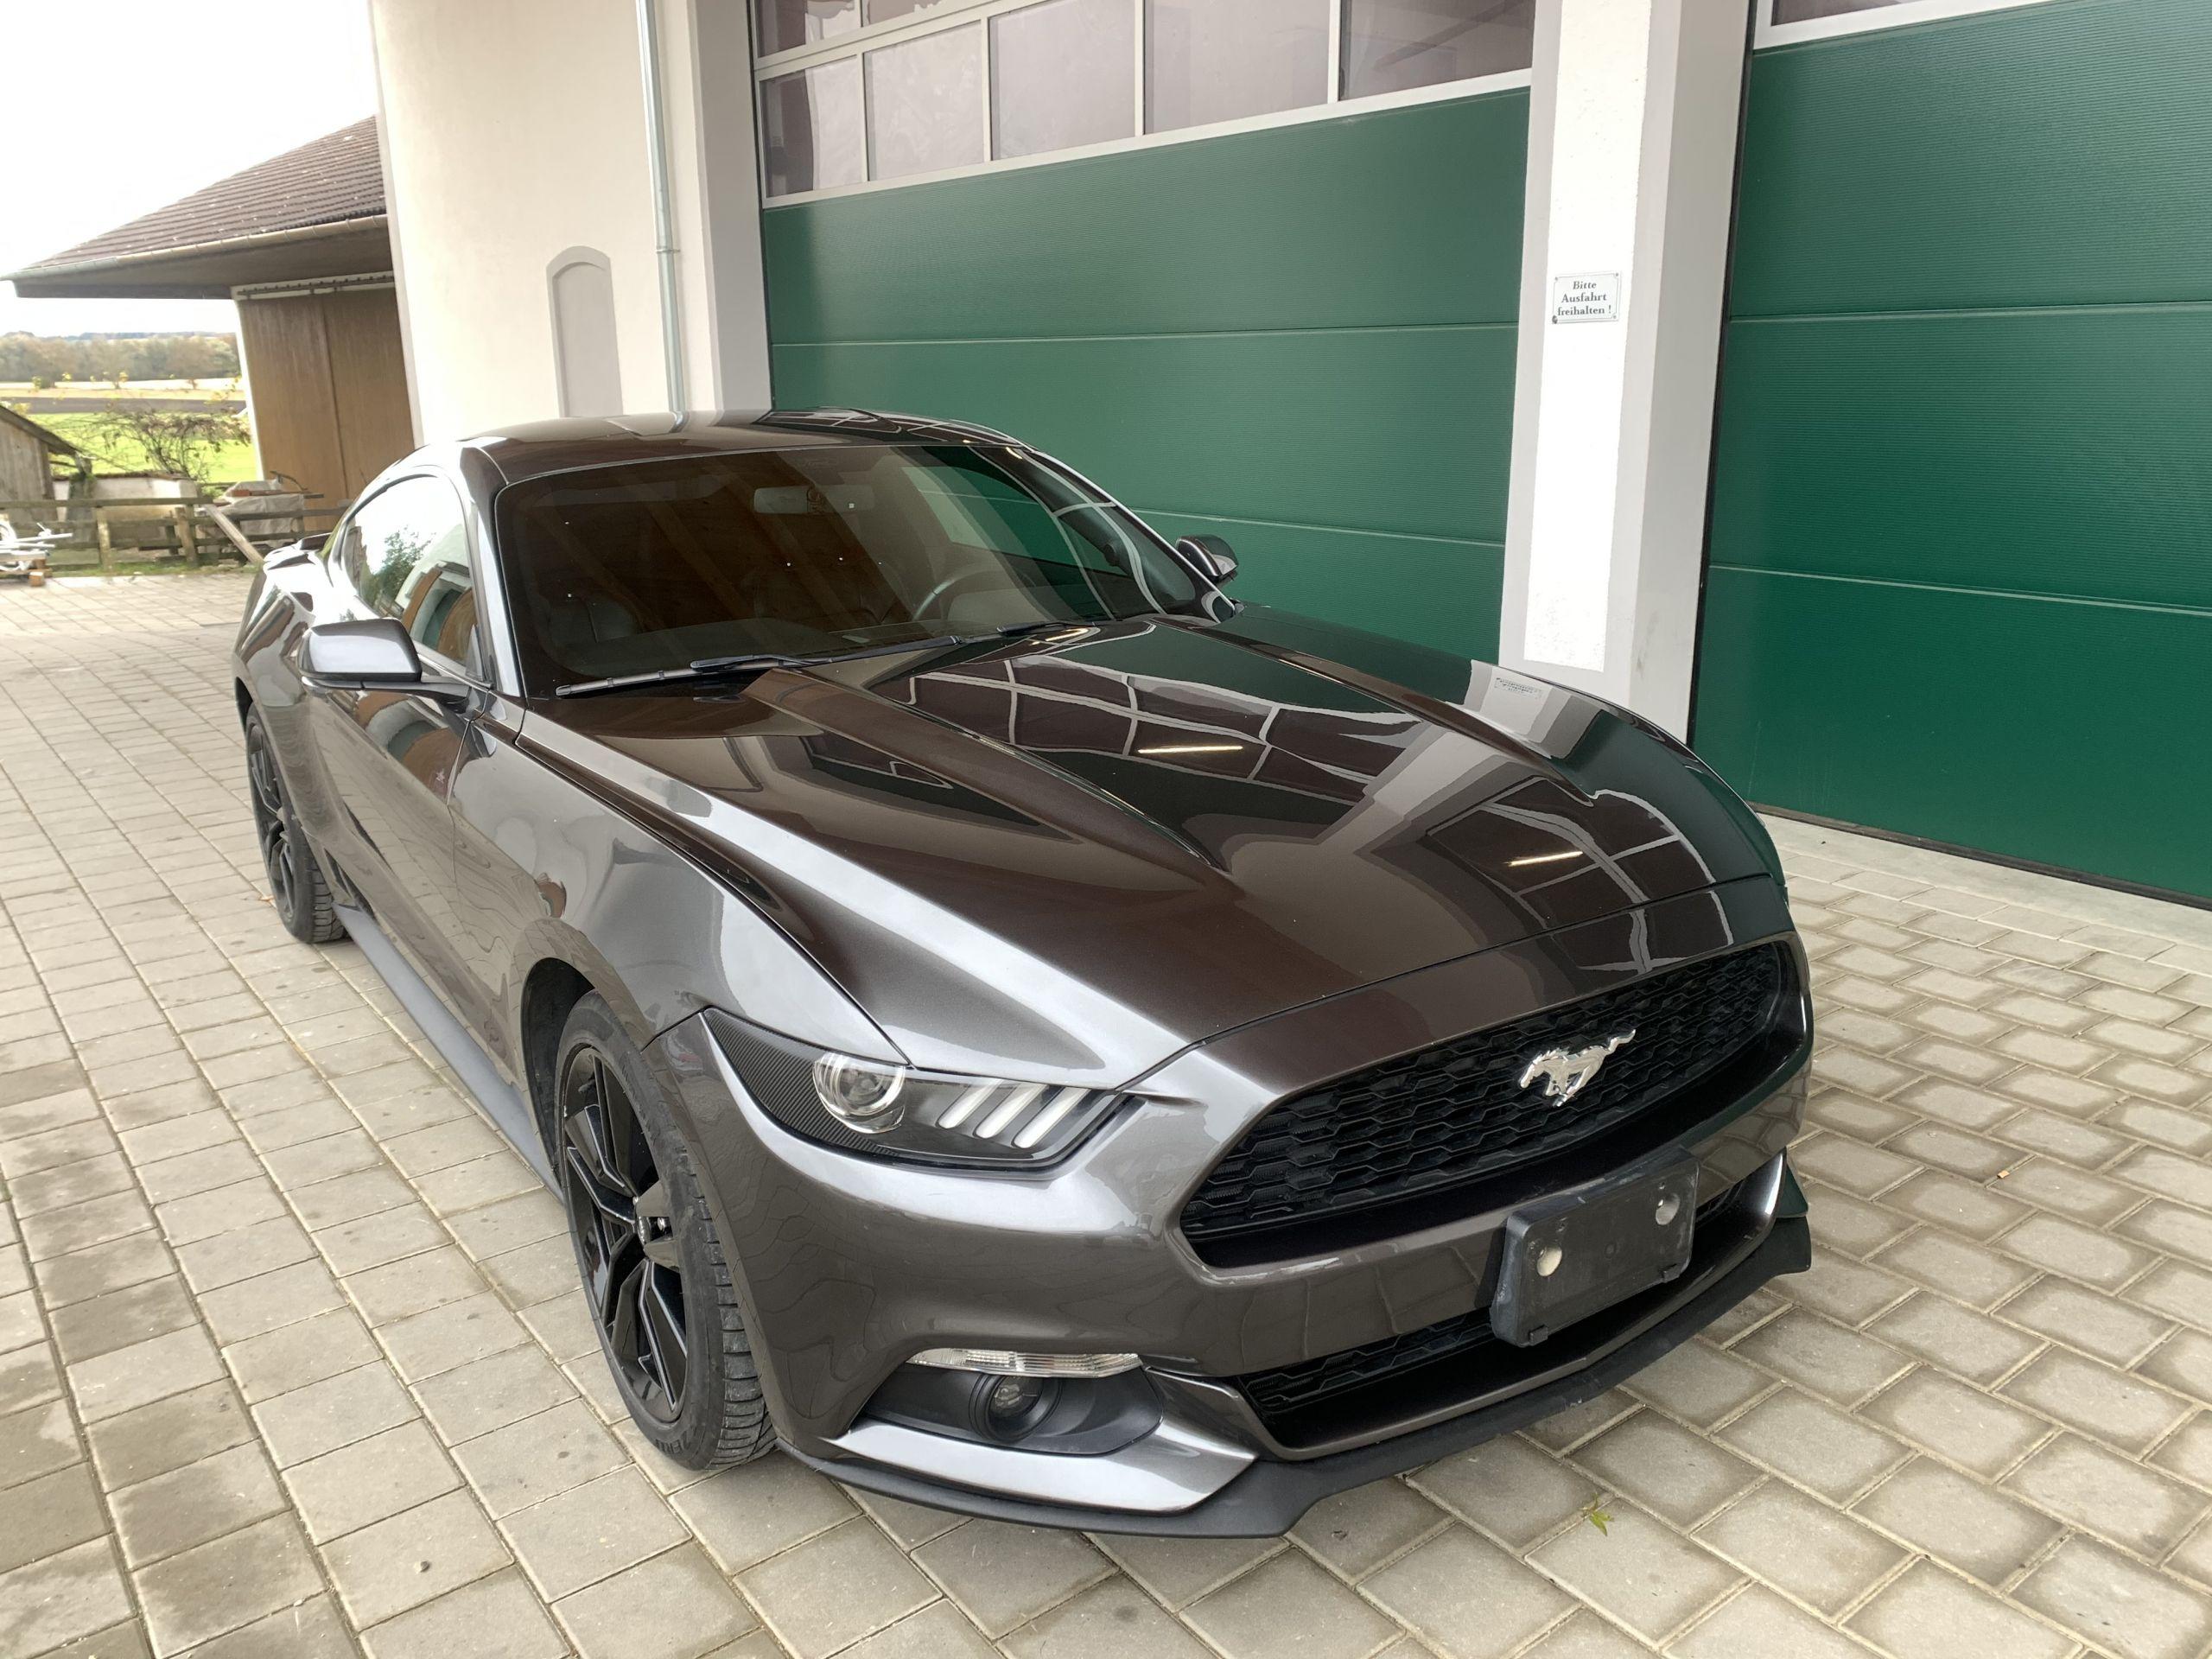 2015 Ford Mustang Roush Bavariasportscars